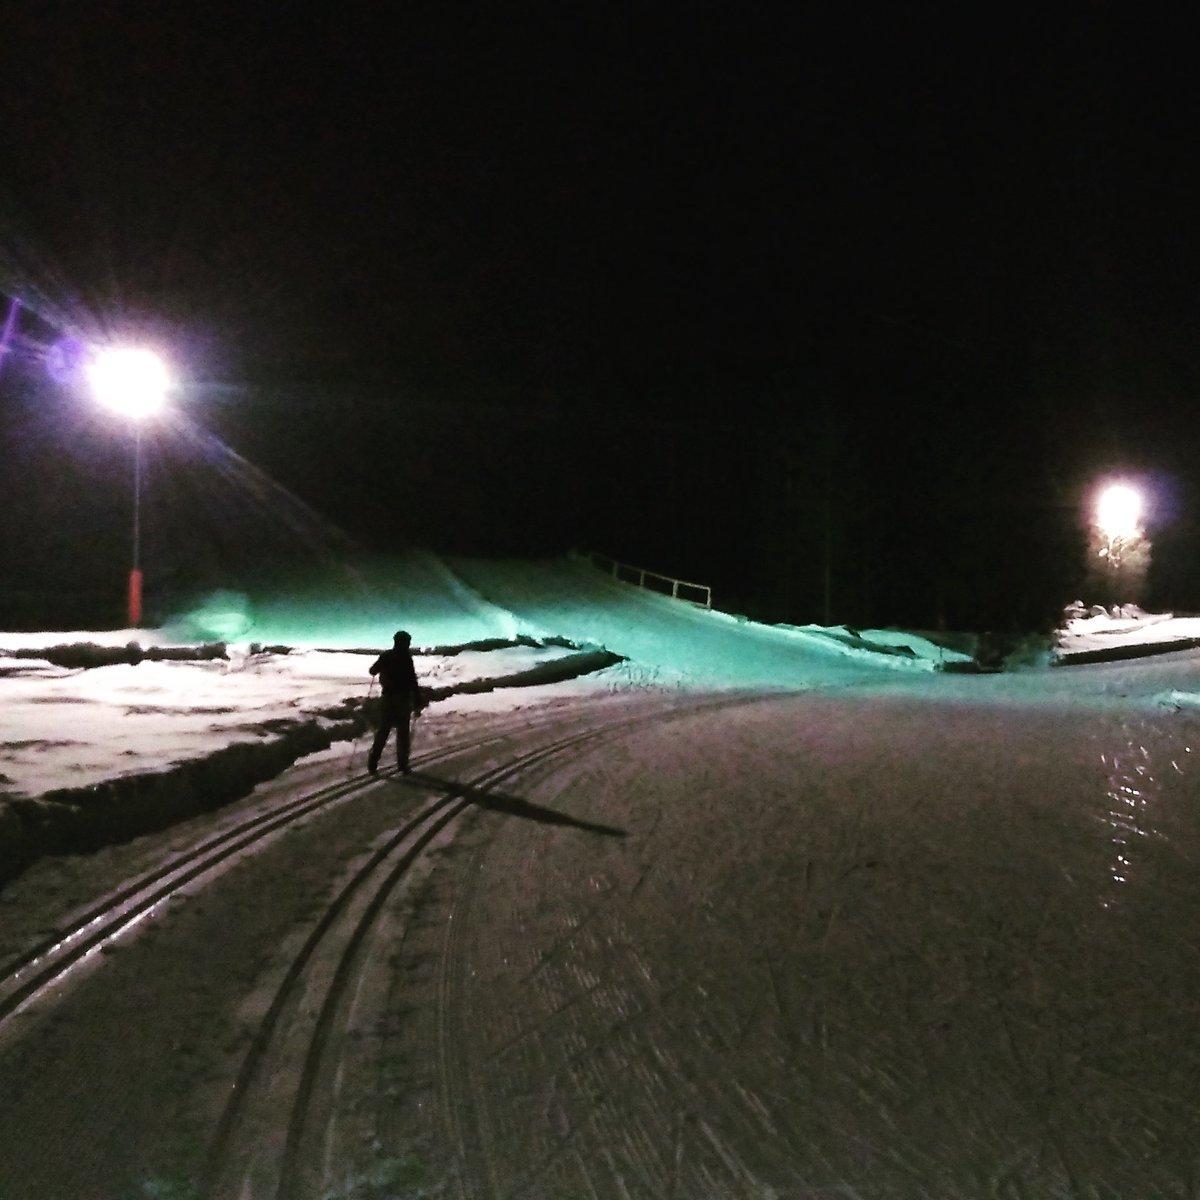 Apres-ski skiing on floodlit loipes